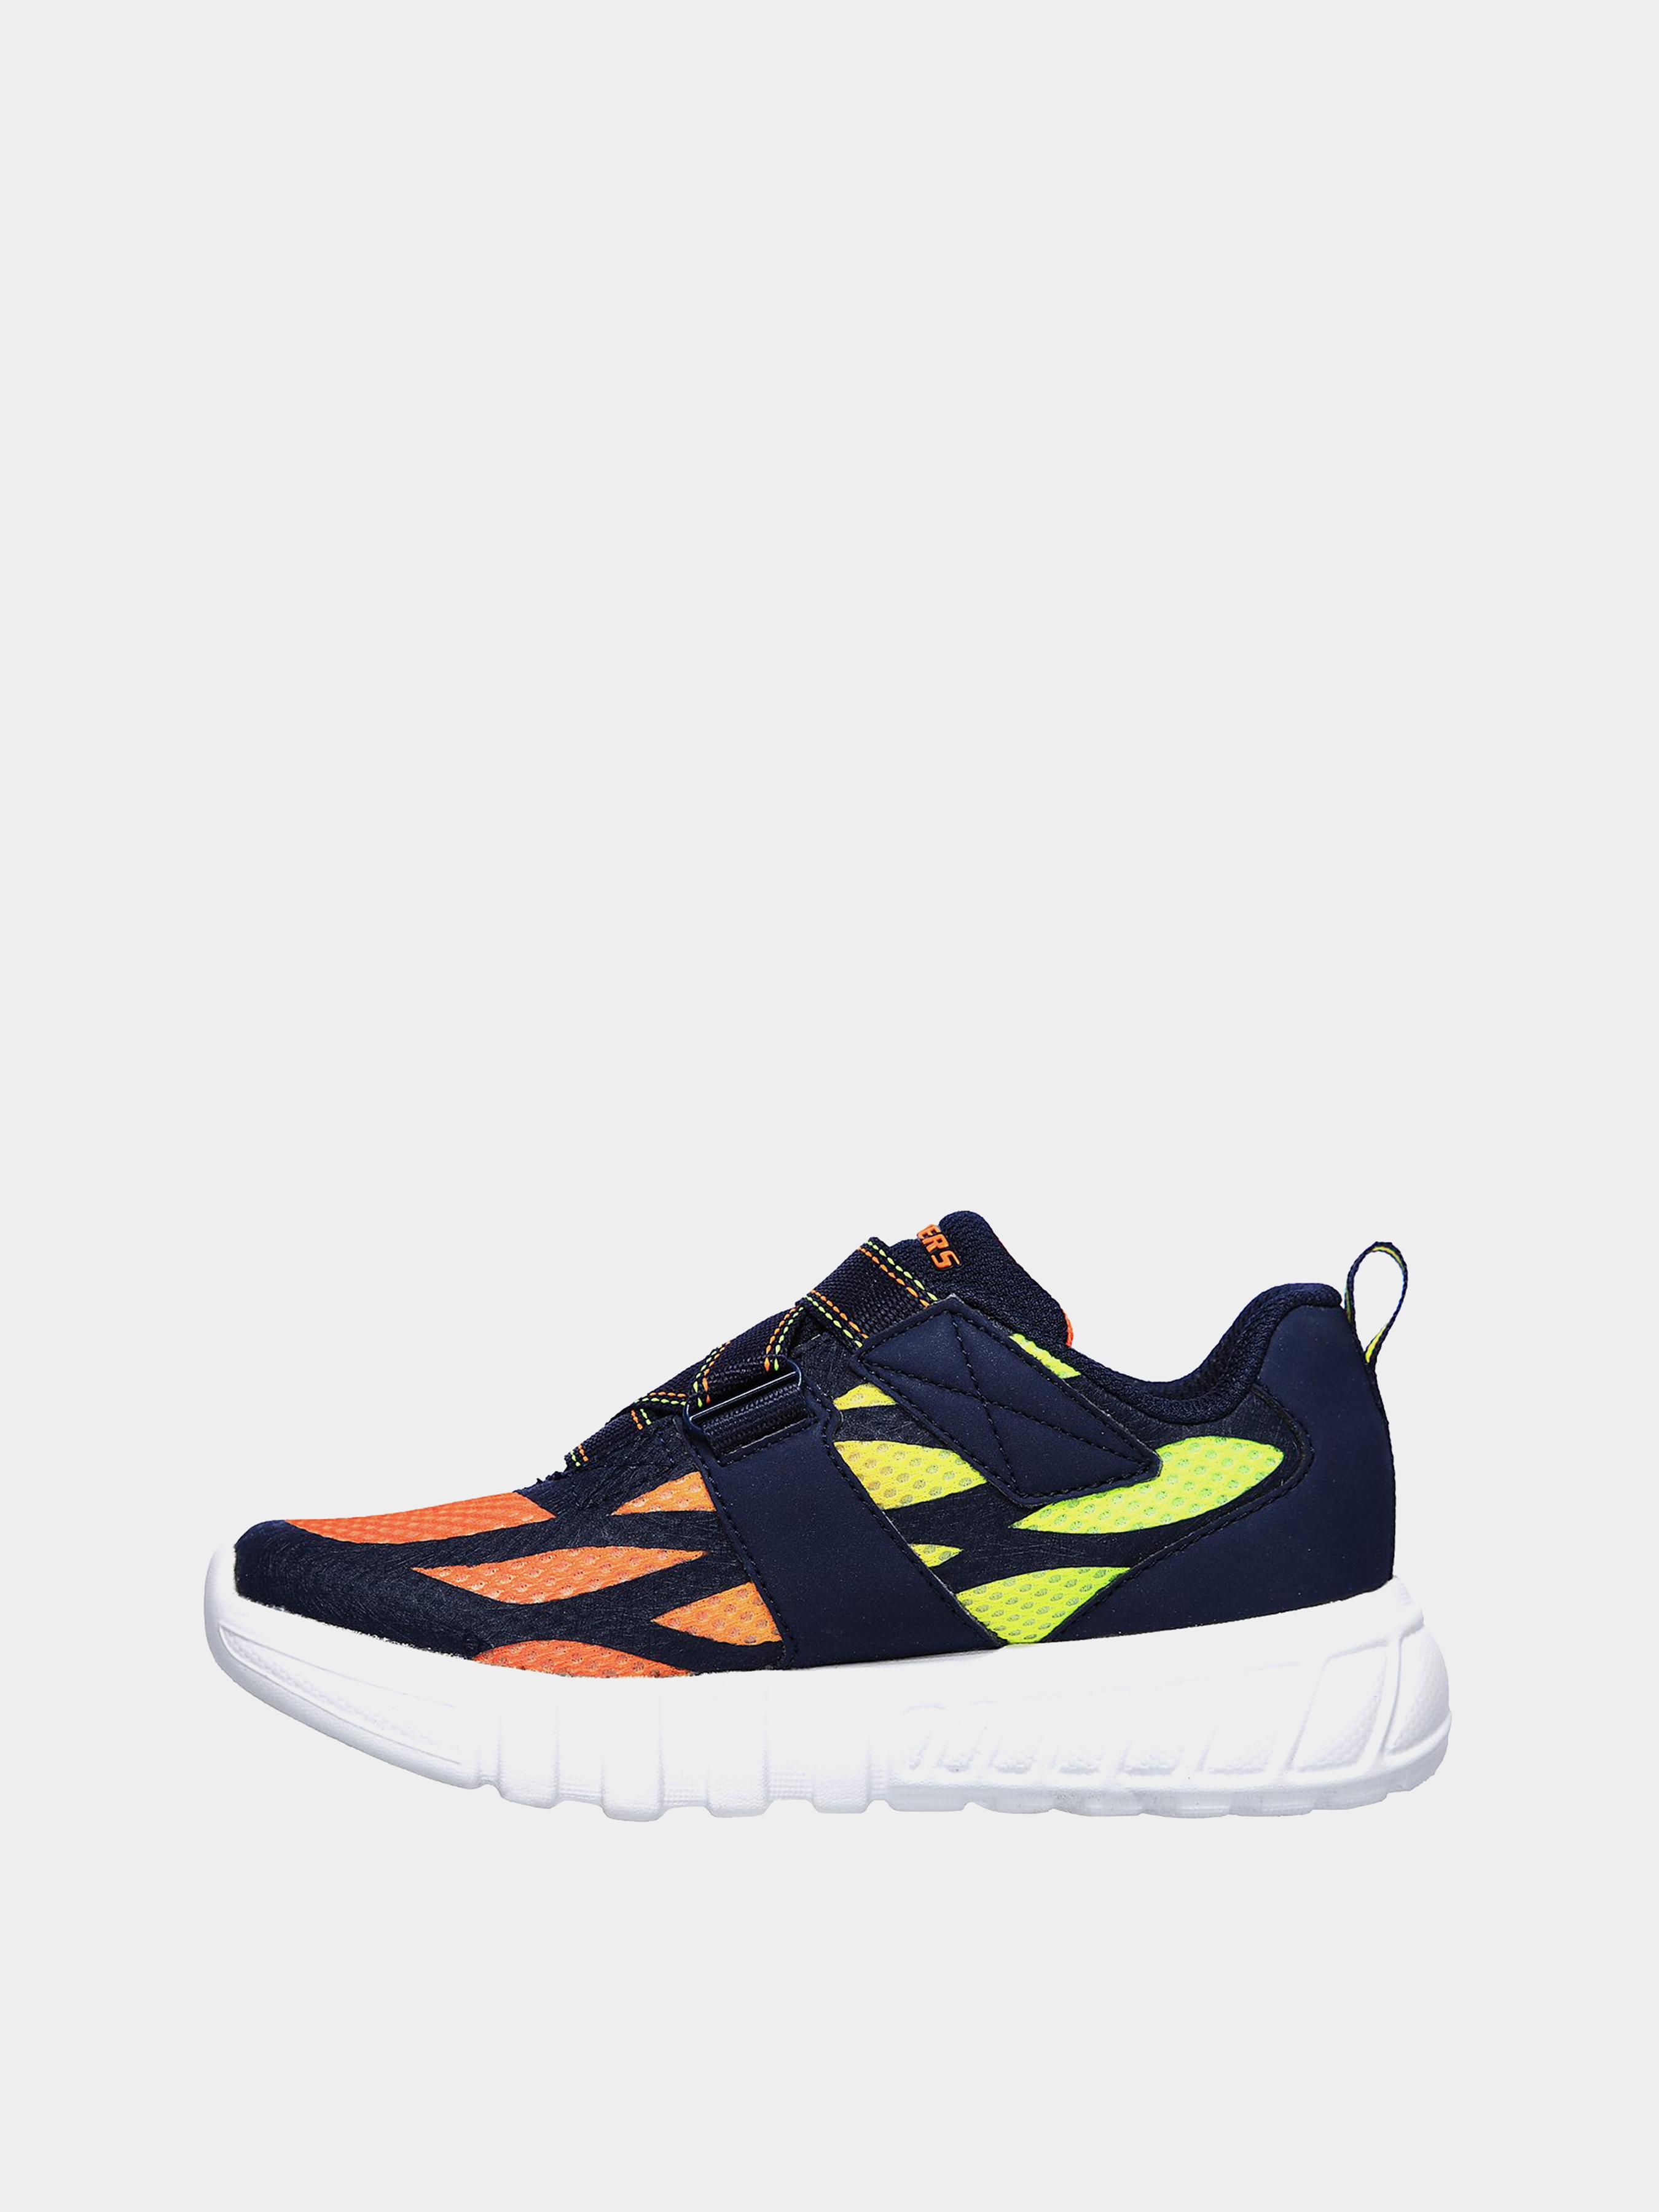 Кросівки для міста Skechers S Lights: Flex-Glow - Lowex 400015L NVOR